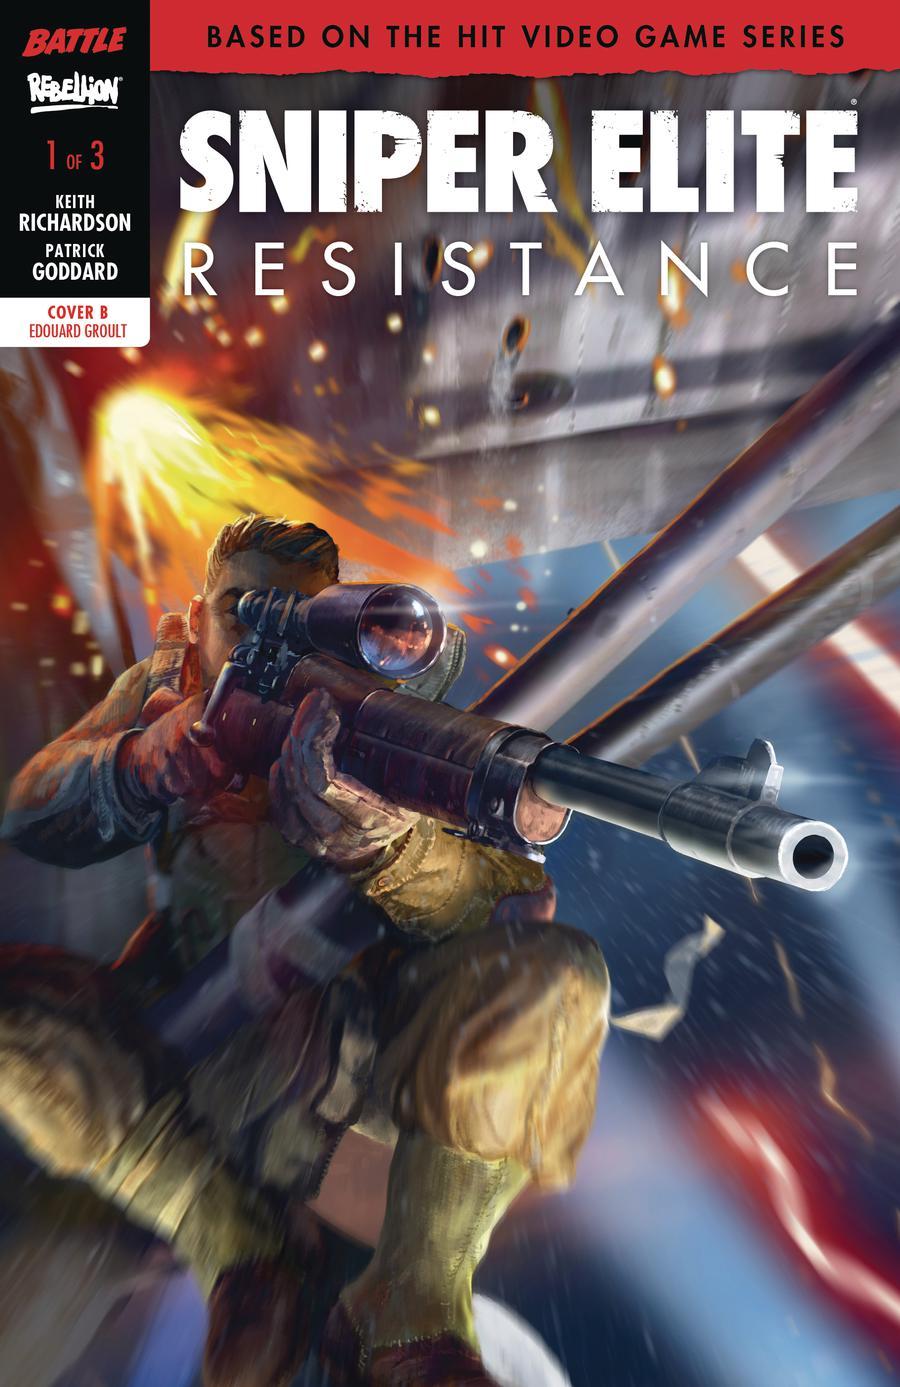 Sniper Elite Resistance #1 Cover B Variant Eduard Groult Cover